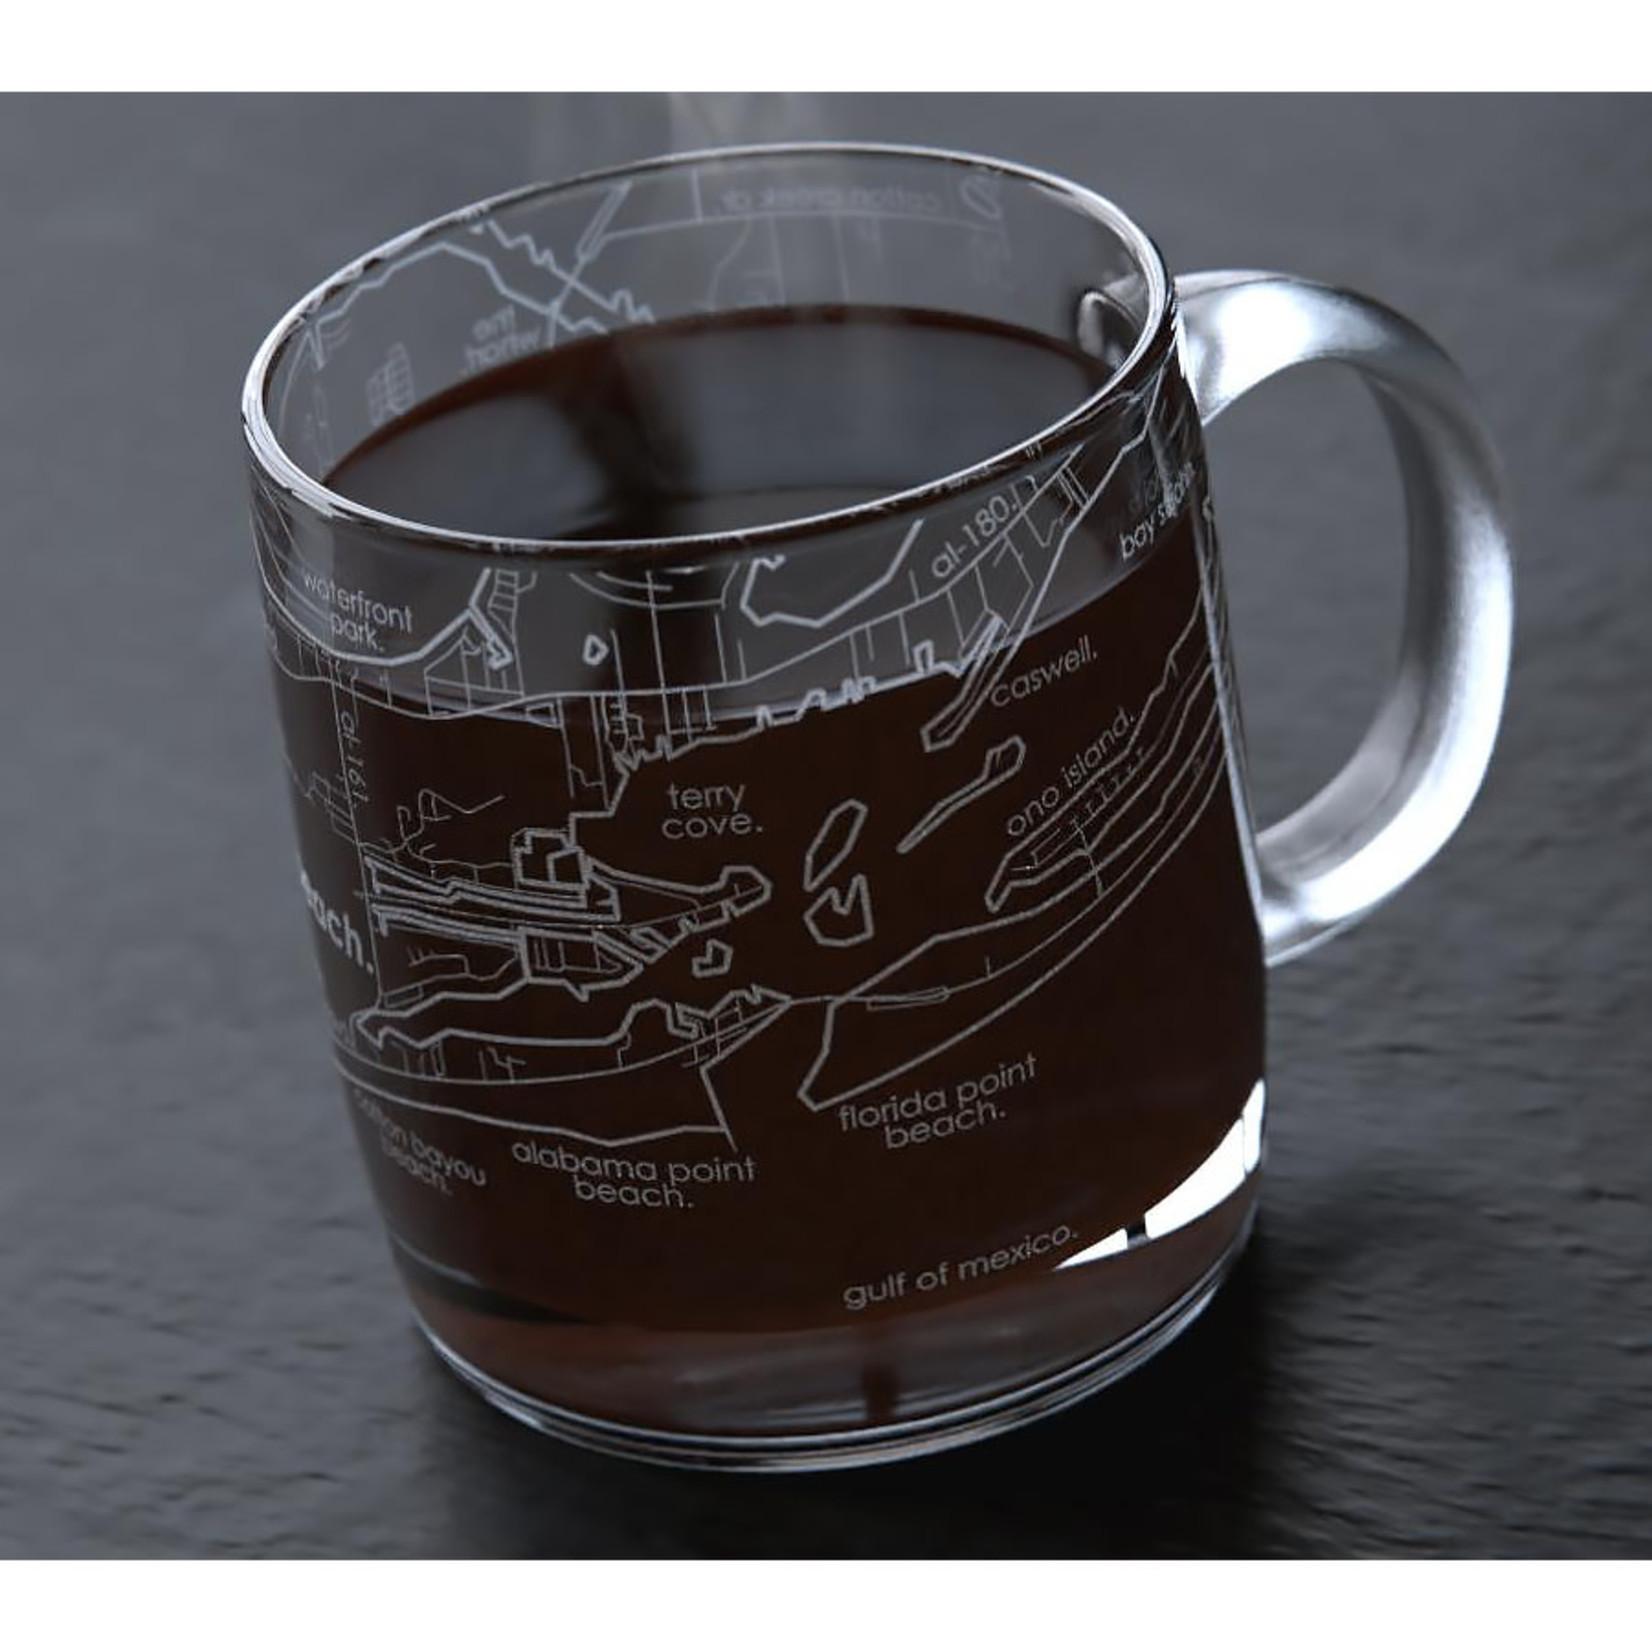 Well Told Orange Beach Map Coffee Mug